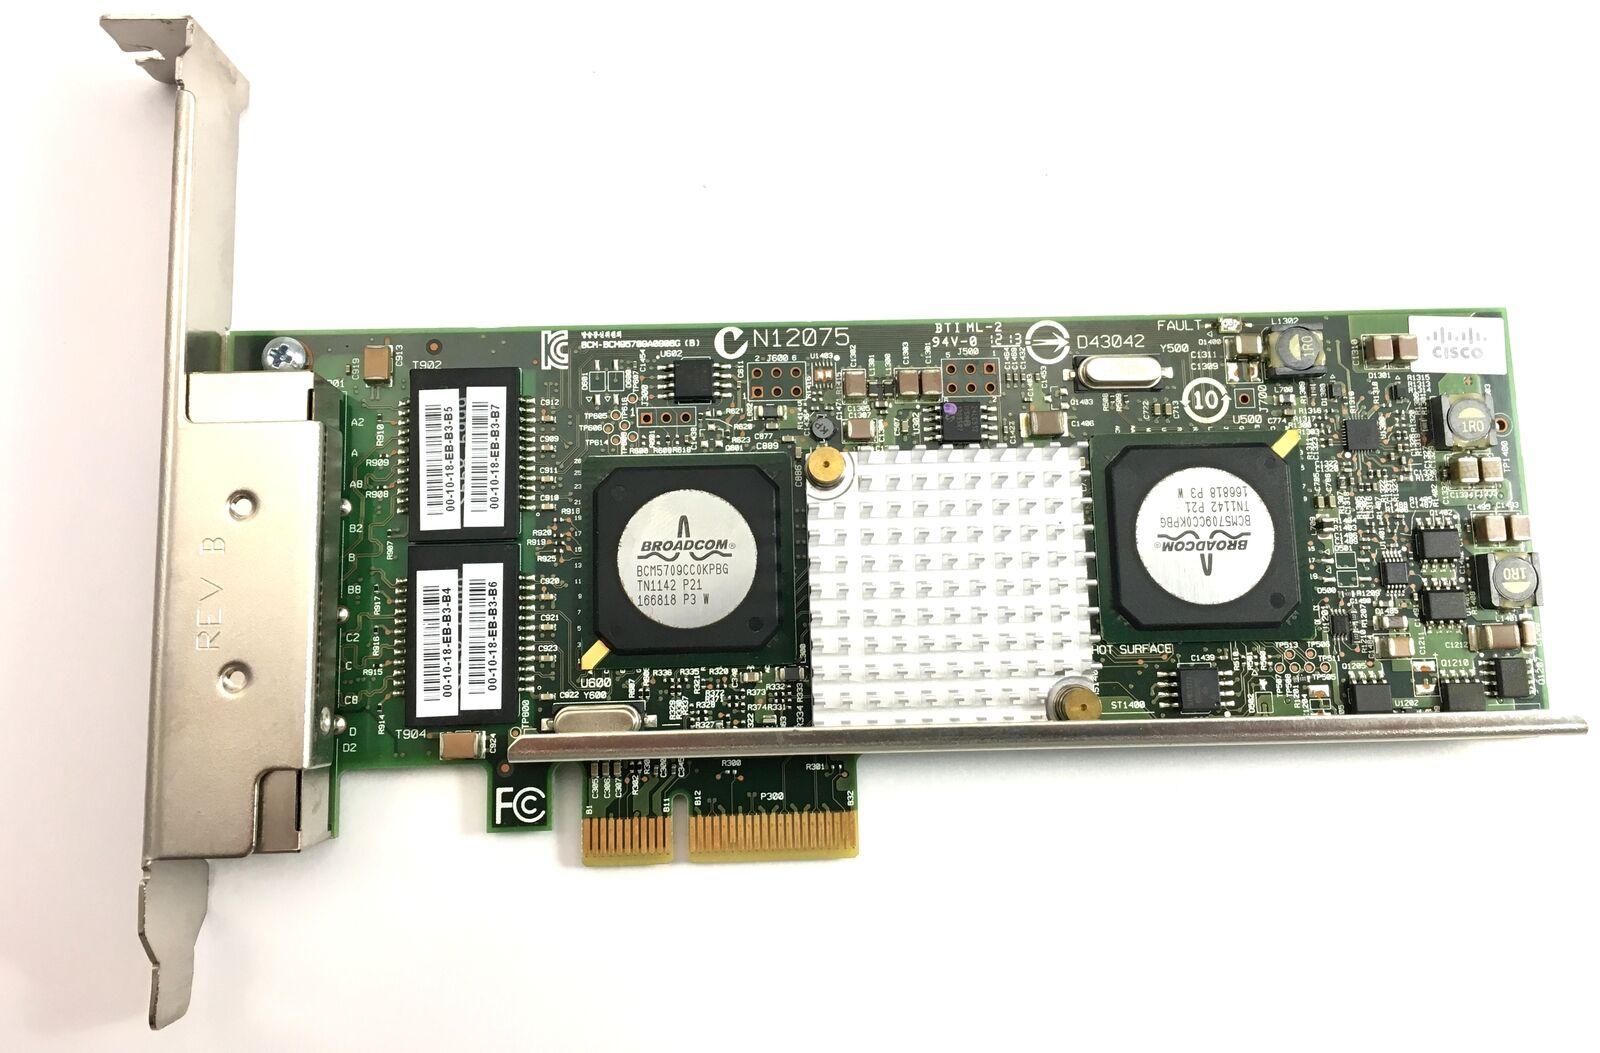 BROADCOM NETXTREME II 5709 DRIVERS FOR PC